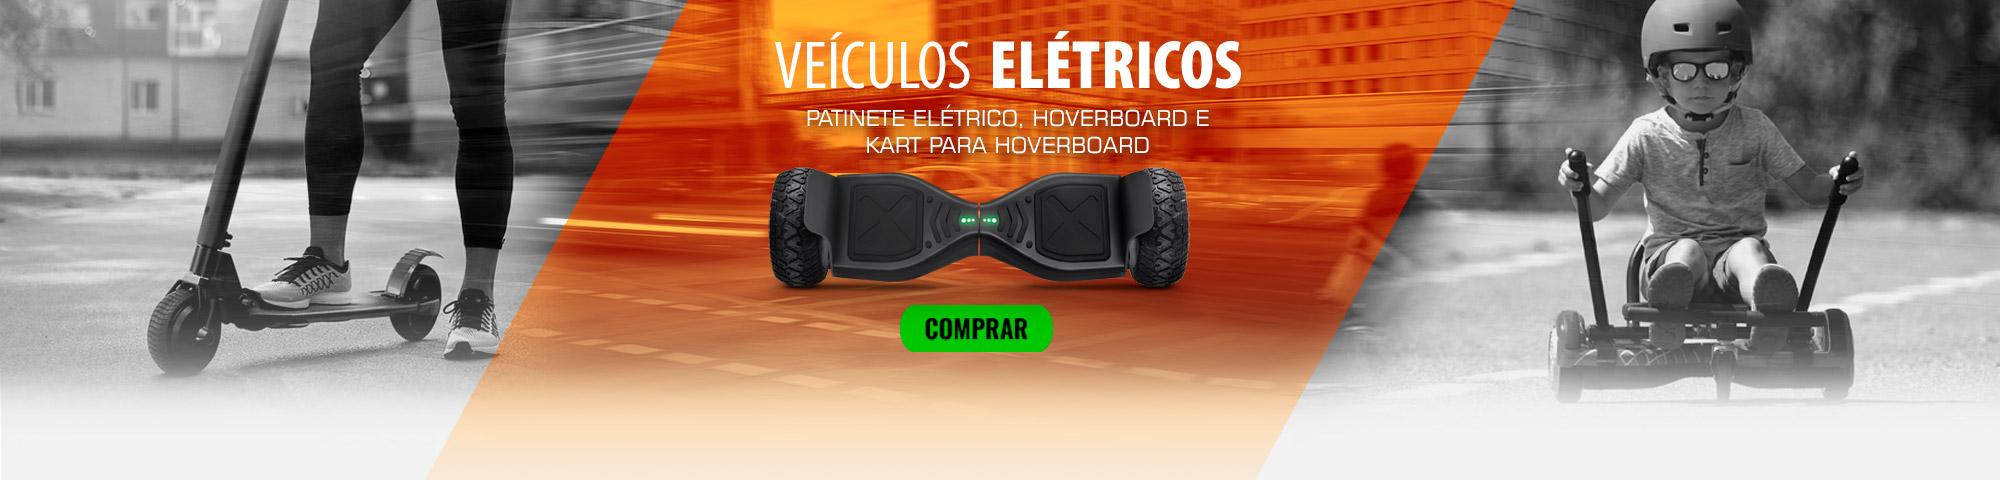 Banner Veiculo Eletrico